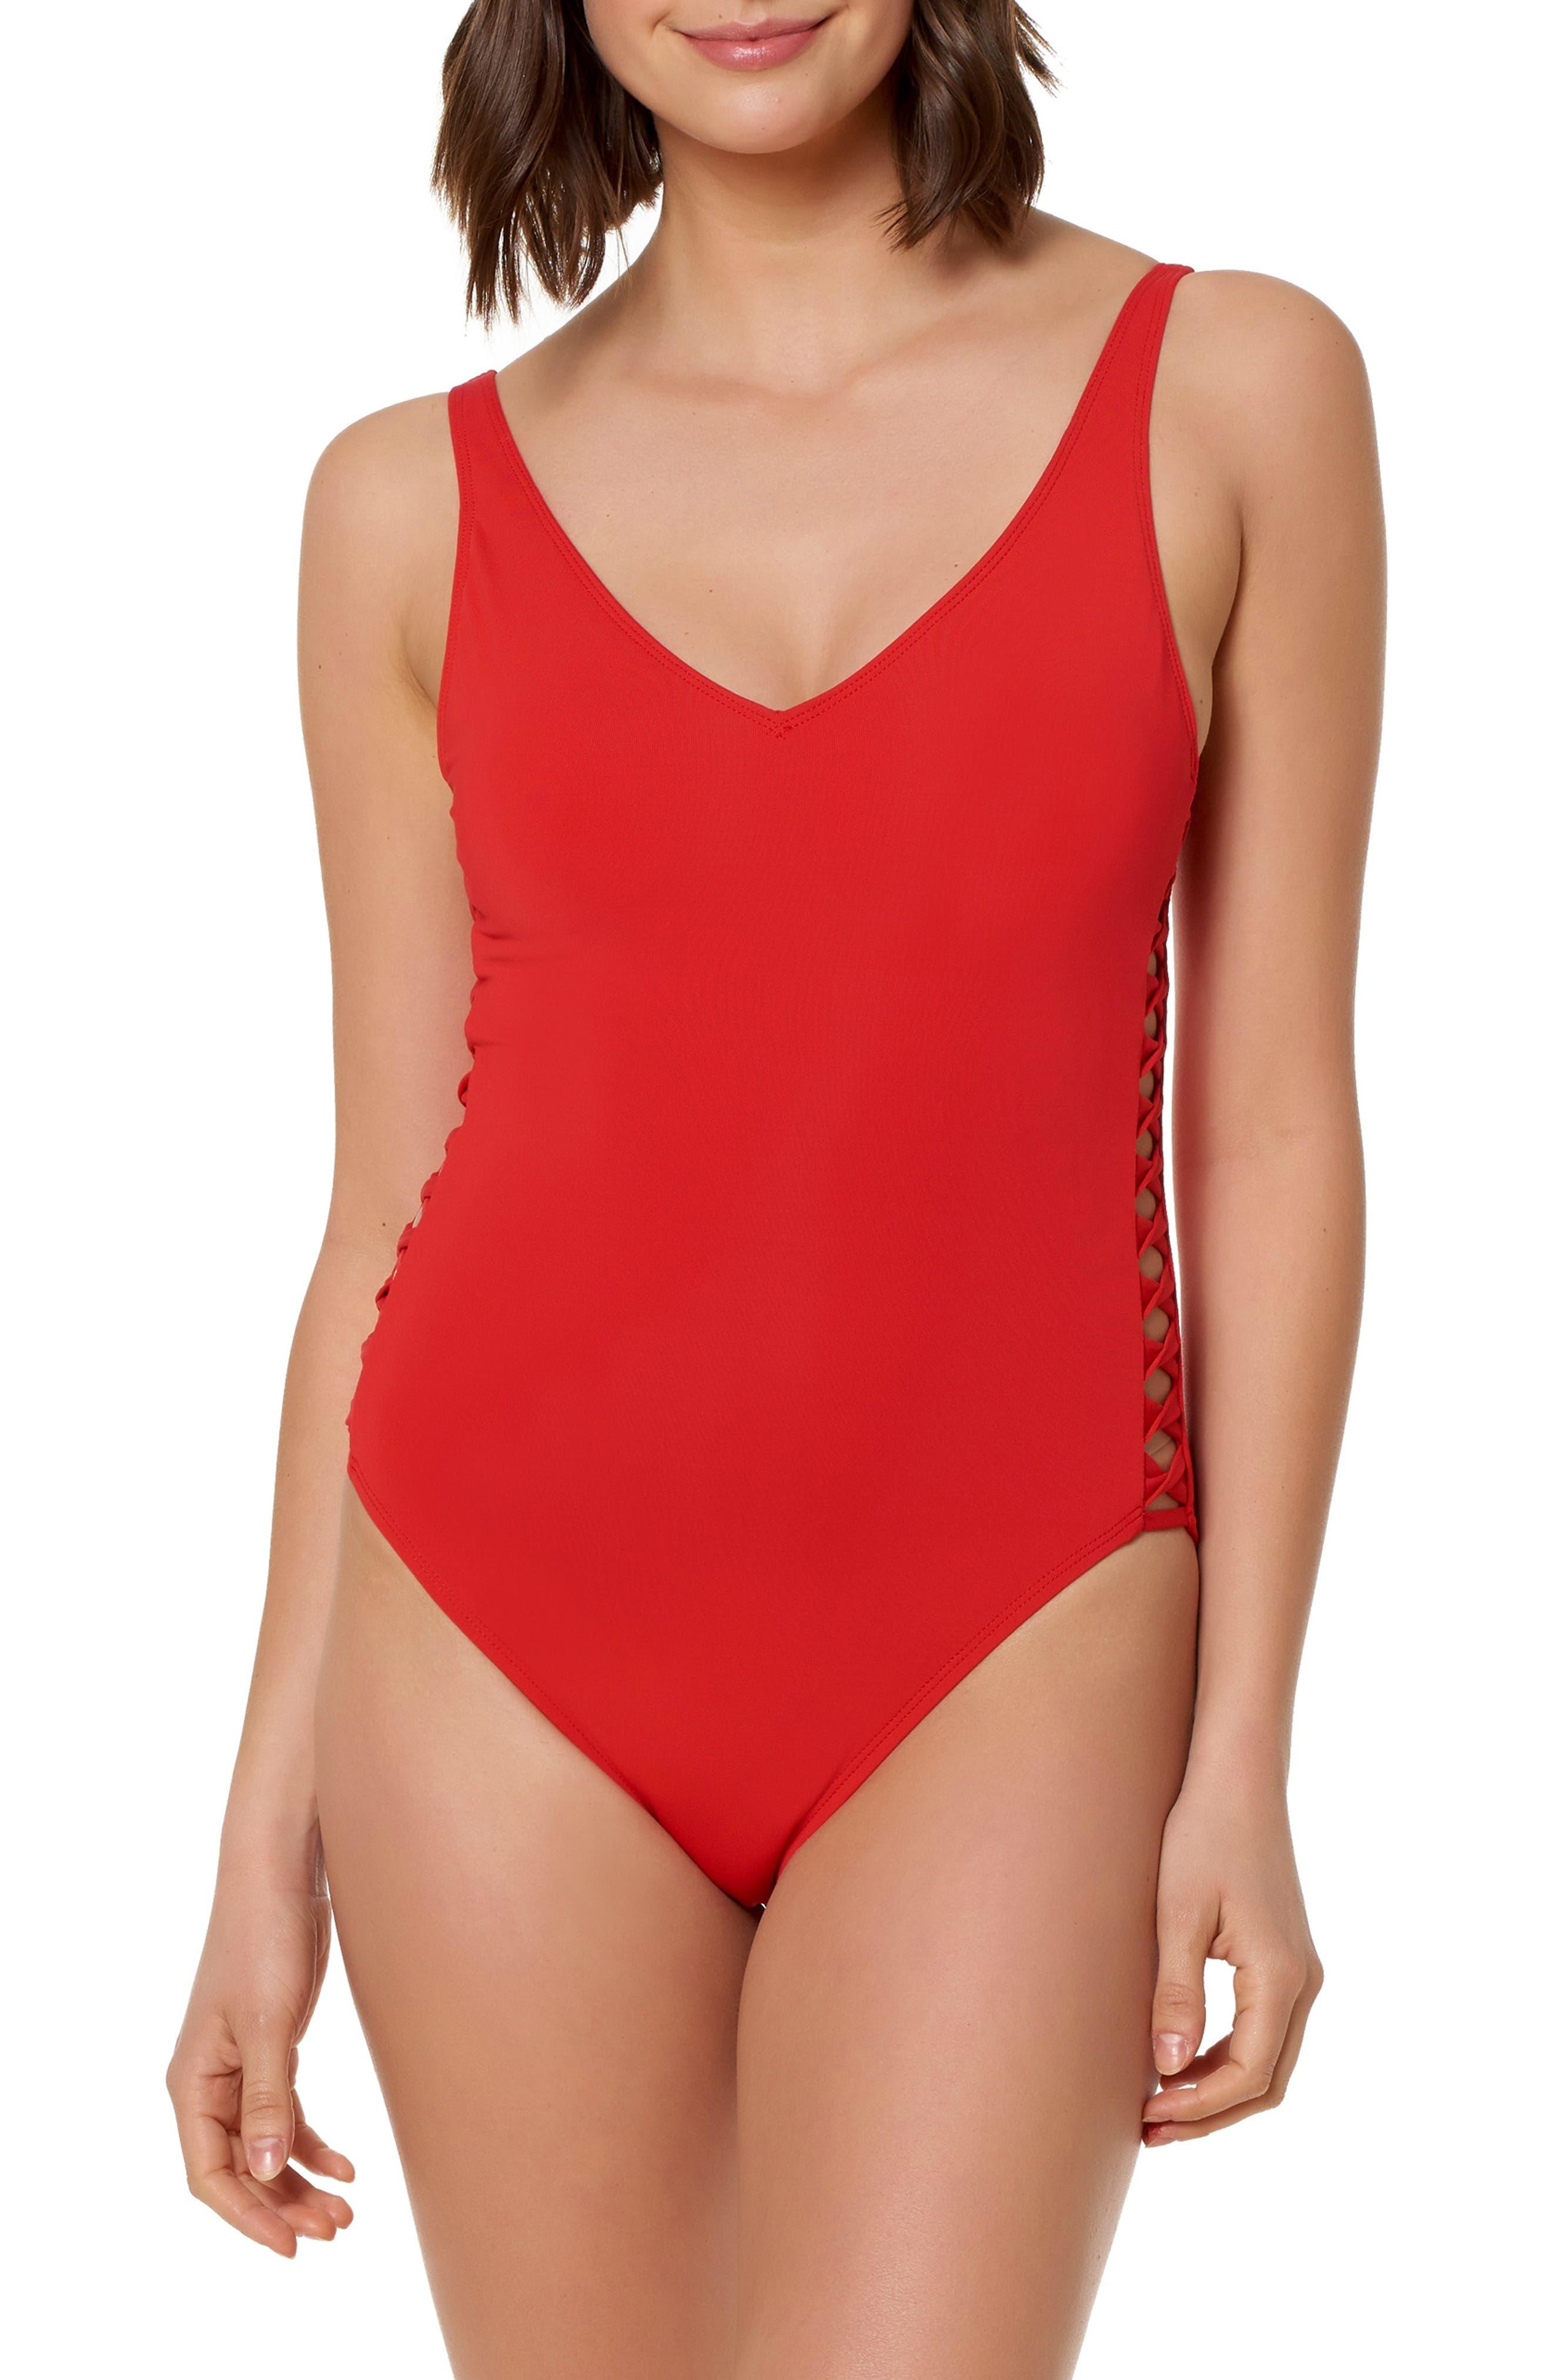 Bleu By Rod Beattie Lattice One-Piece Swimsuit, Red